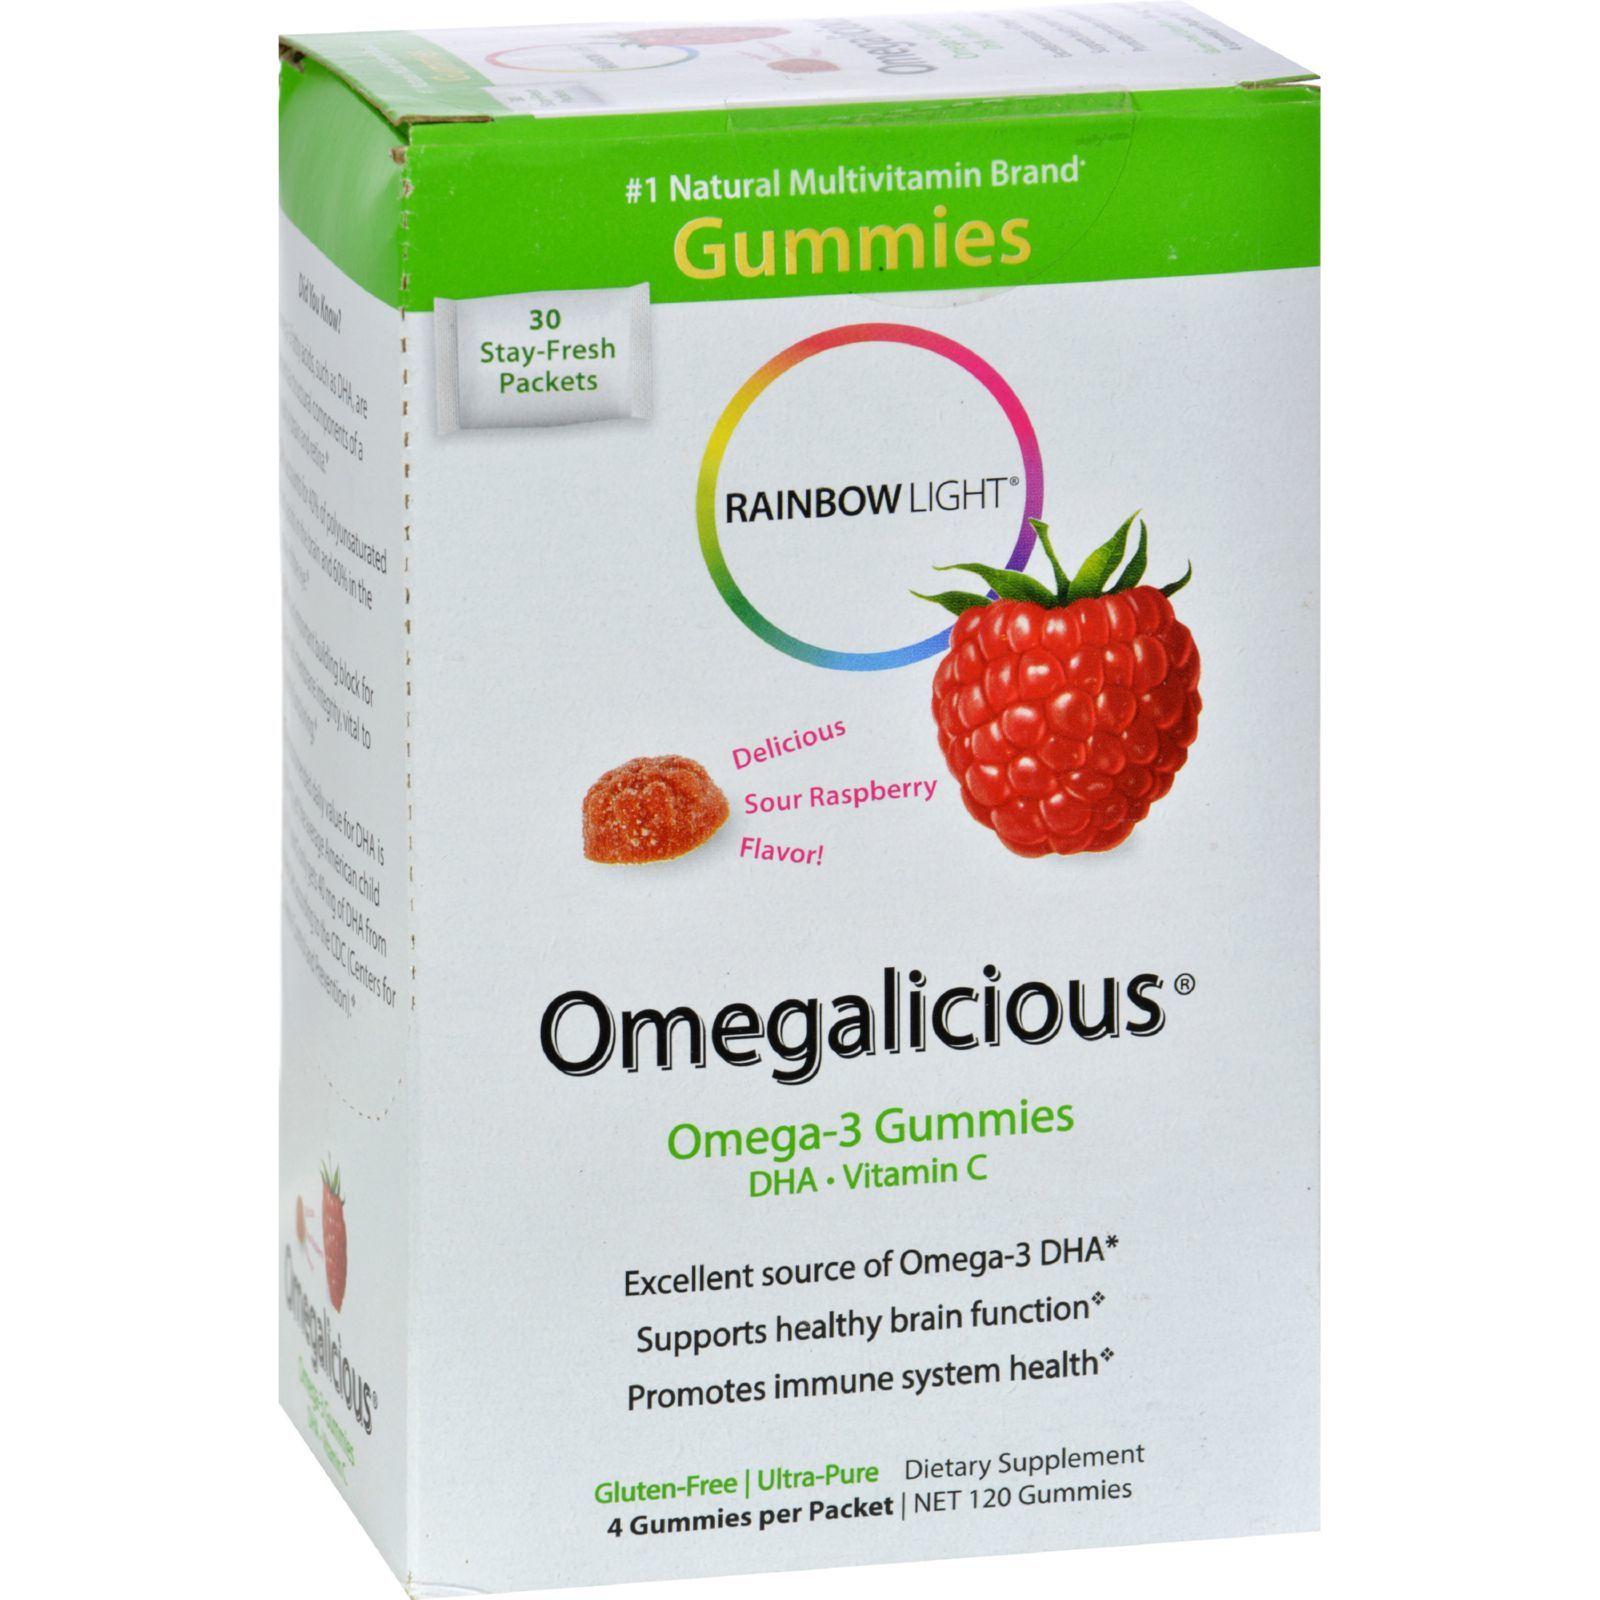 Rainbow Light Gummy Omegalicious Omega 3 Formula Sour Raspberry - 30 Packets